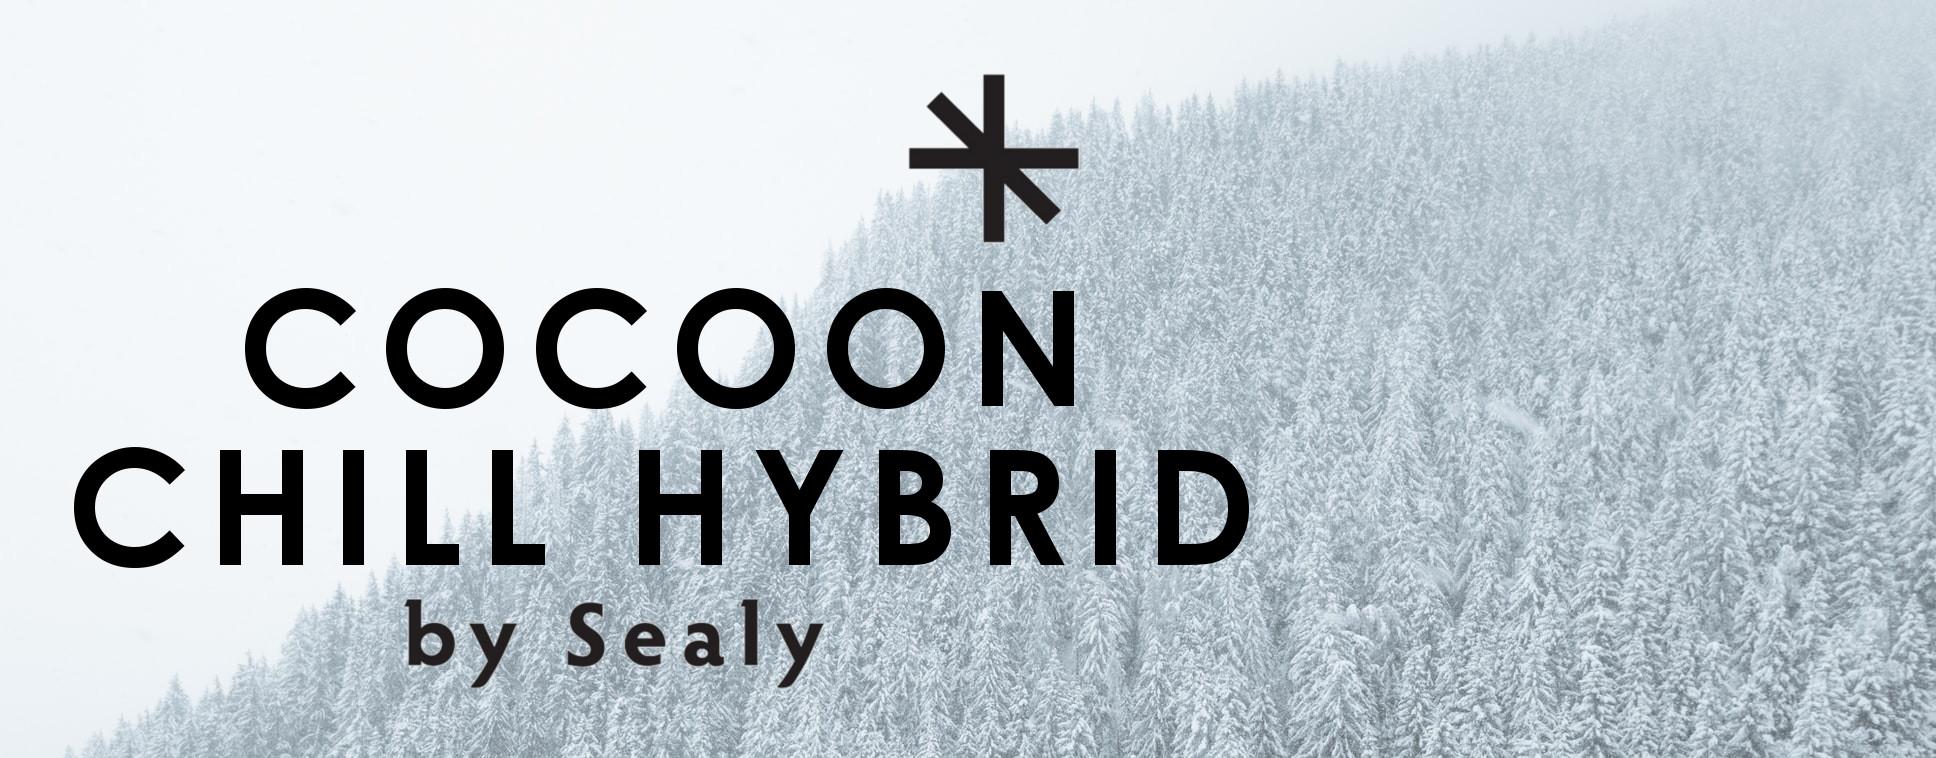 cocoon chill hybrid mattress